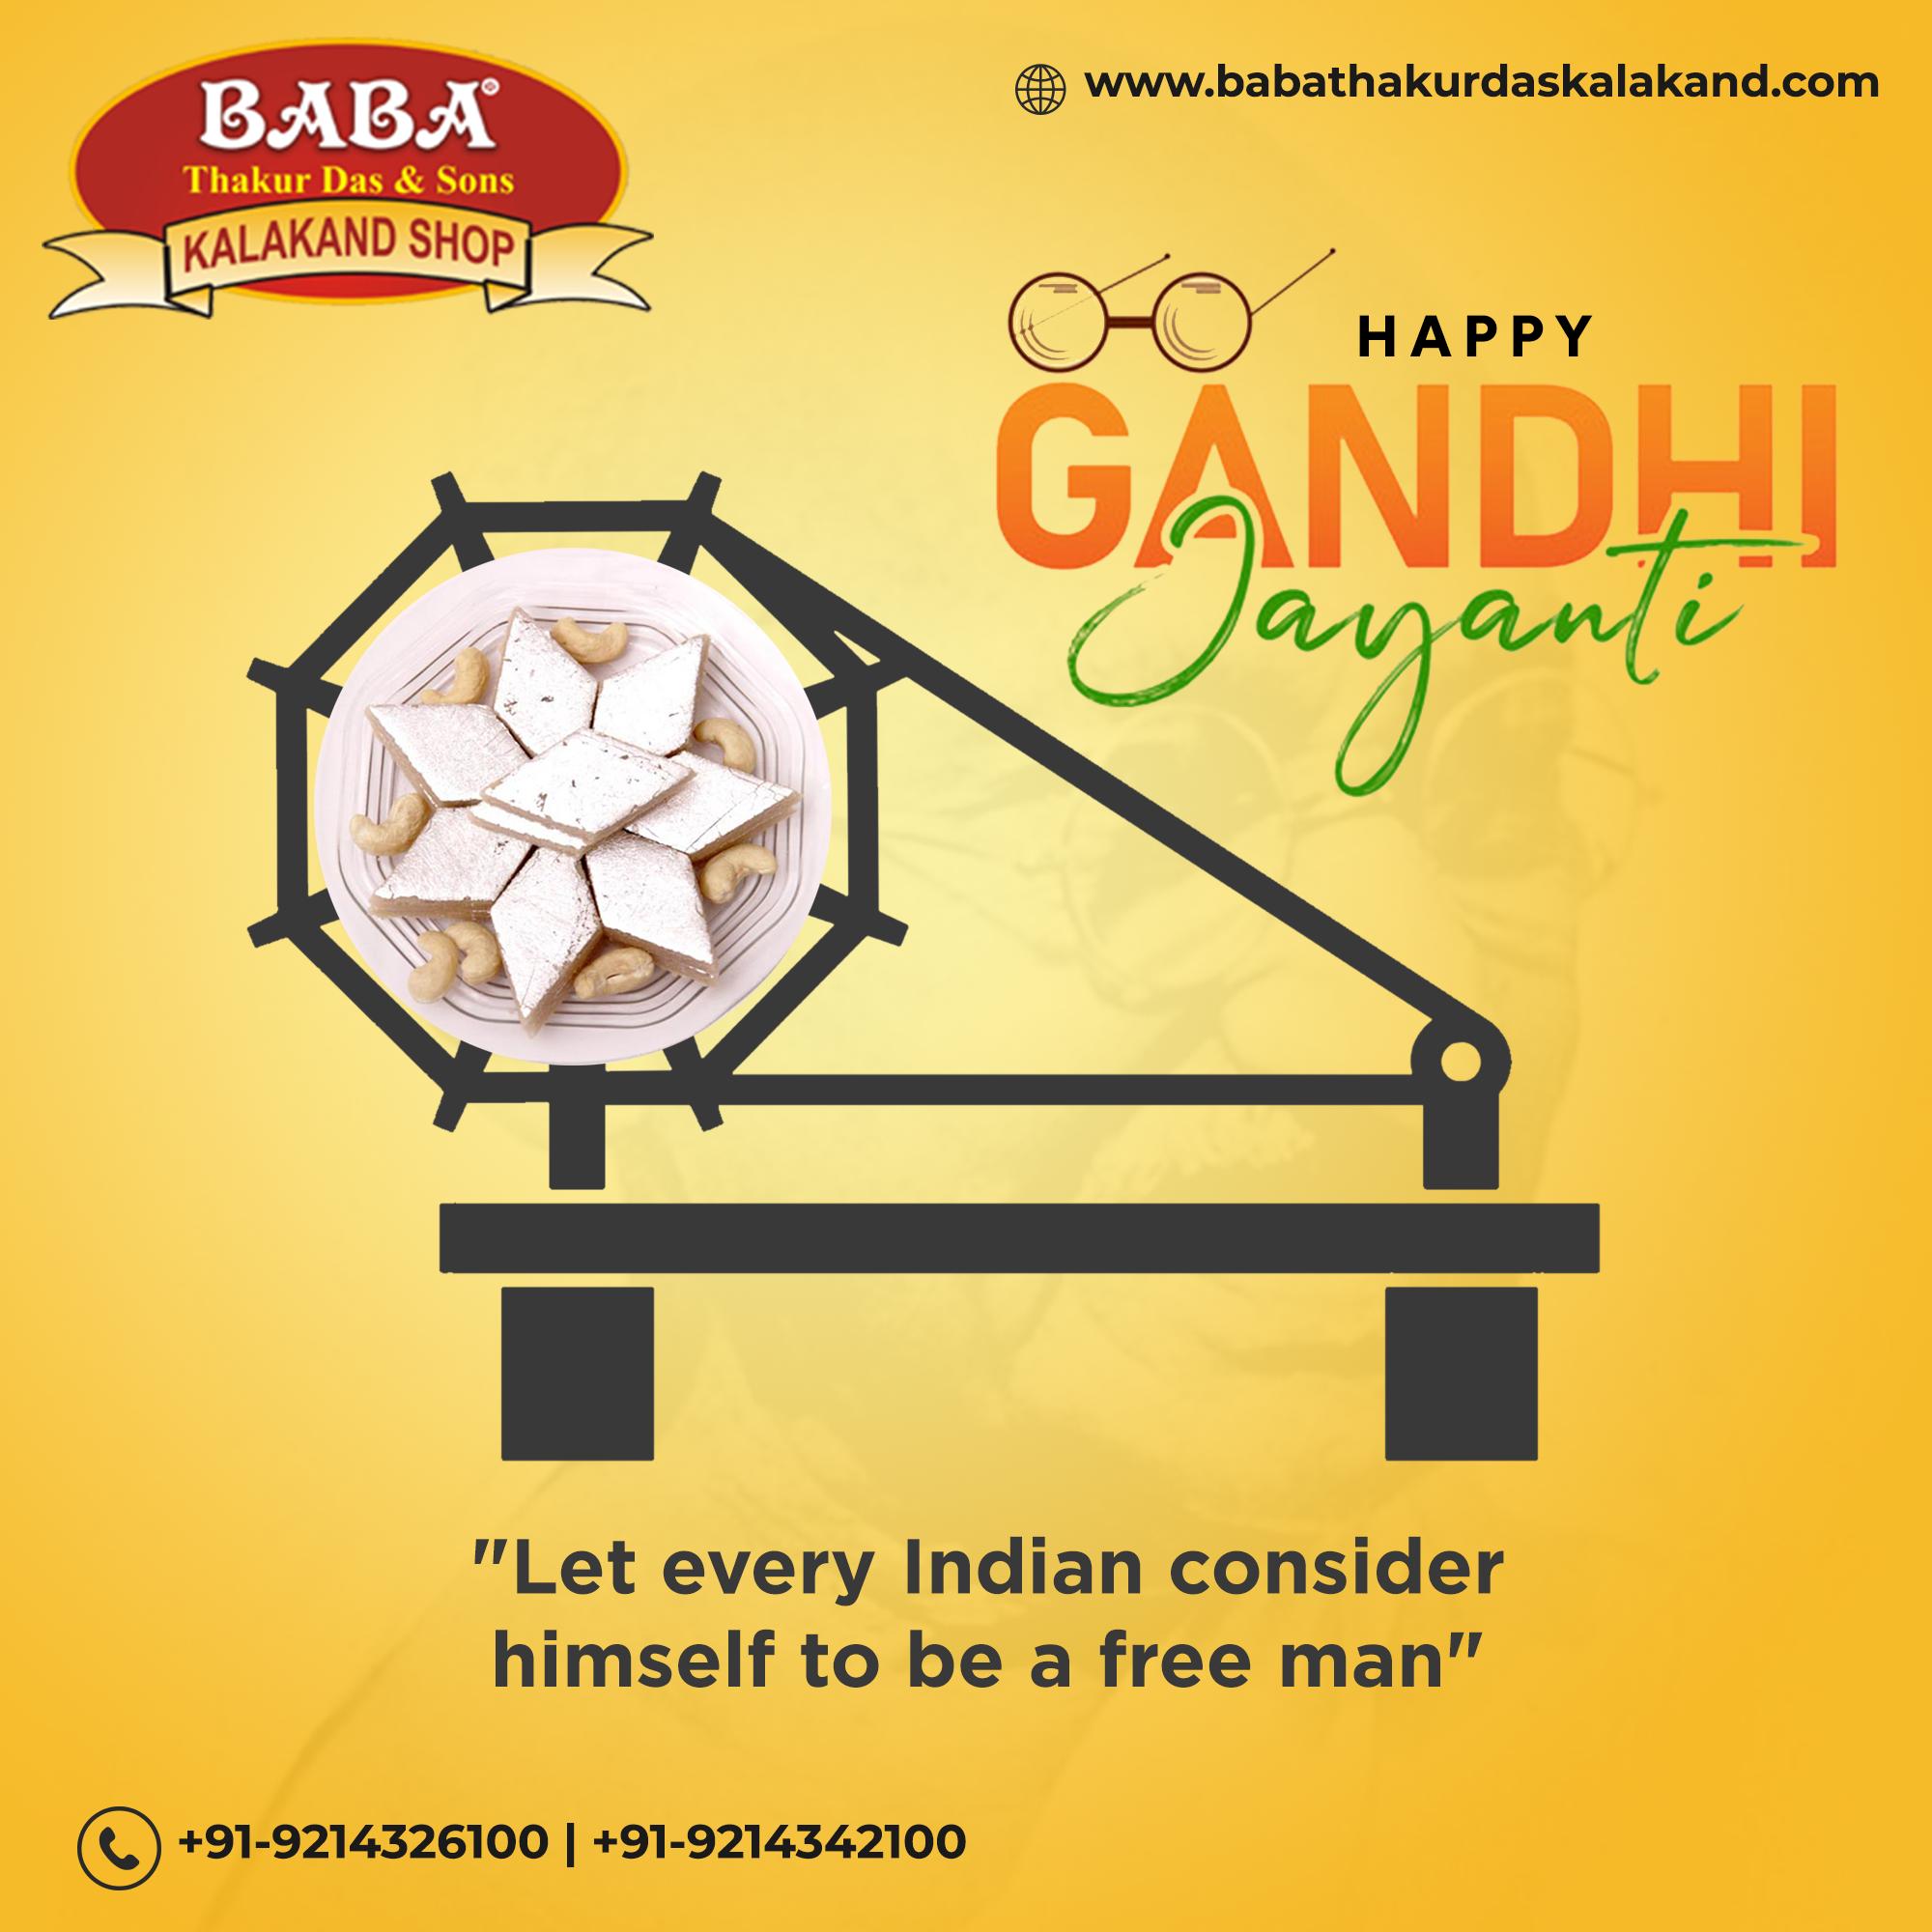 Experience Authentic Swadeshi Taste This Gandhi Jayanti. Happy Gandhi Jayanti.📞+91-9214326100 📞+91-9214342100  #mahatmagandhijayanti #gandhijayanti #mahatmagandhi #gandhiji #gandhi #india #gandhiquotes #freedom #october #bapu #fatherofnation #quote #mahatma #baapu #peace #gandhijayantispecial #quoteoftheday #nonviolence #happygandhijayanti #gandhijayanticreative #banner #sweetshop #sweets #indiansweets #yummy #foodies